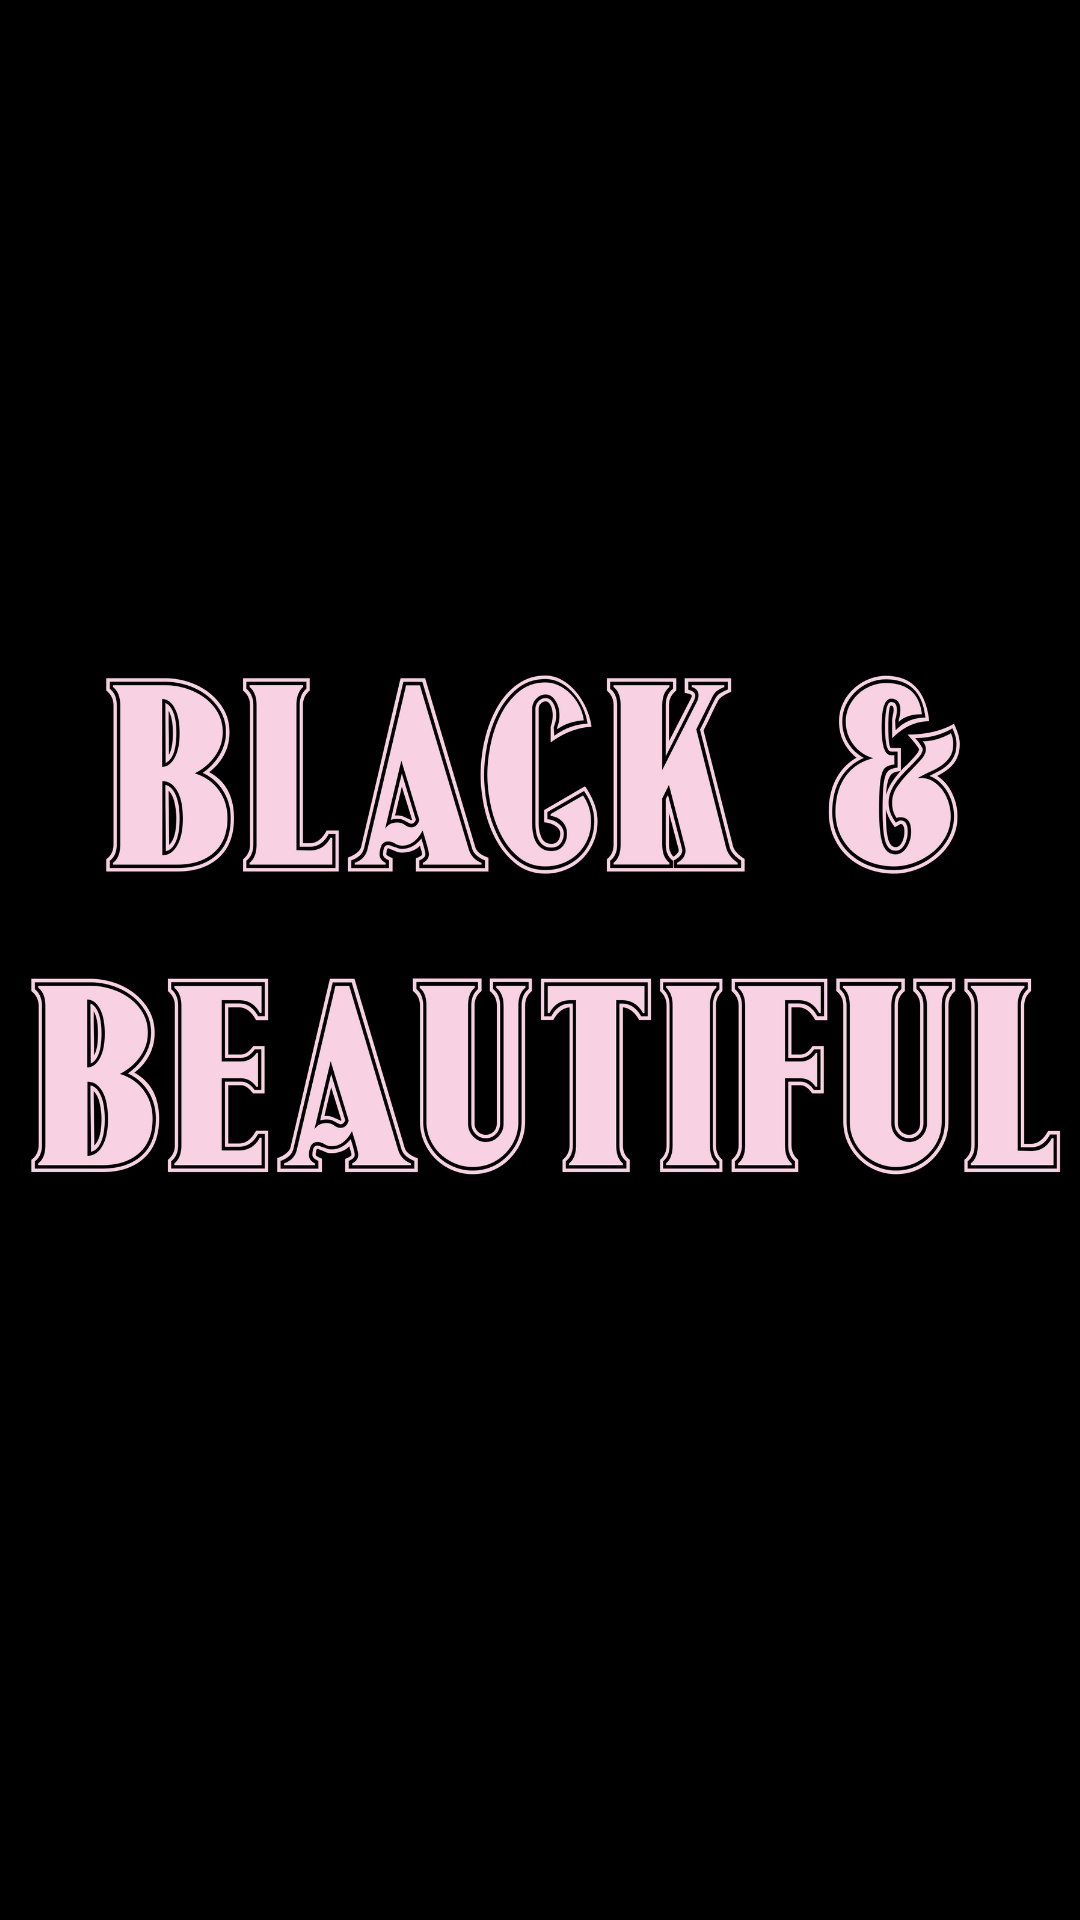 Black Beautiful Pastel Aesthetic Quote Blm Black Lives Matter Quotes Pastel Qu Black Aesthetic Wallpaper Girl Iphone Wallpaper Aesthetic Iphone Wallpaper